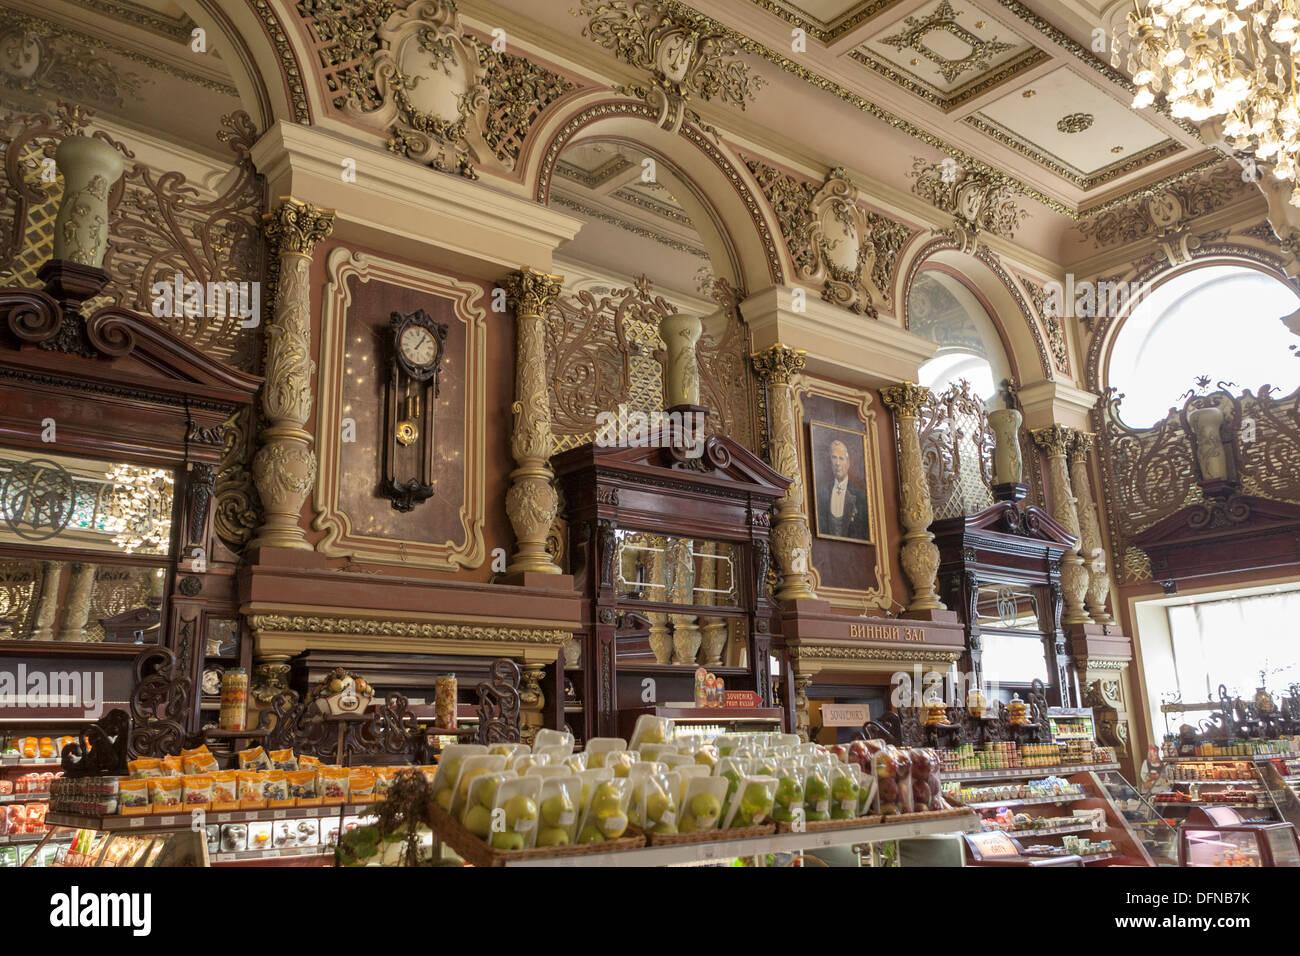 Historic Food Hall Stock Photos & Historic Food Hall Stock